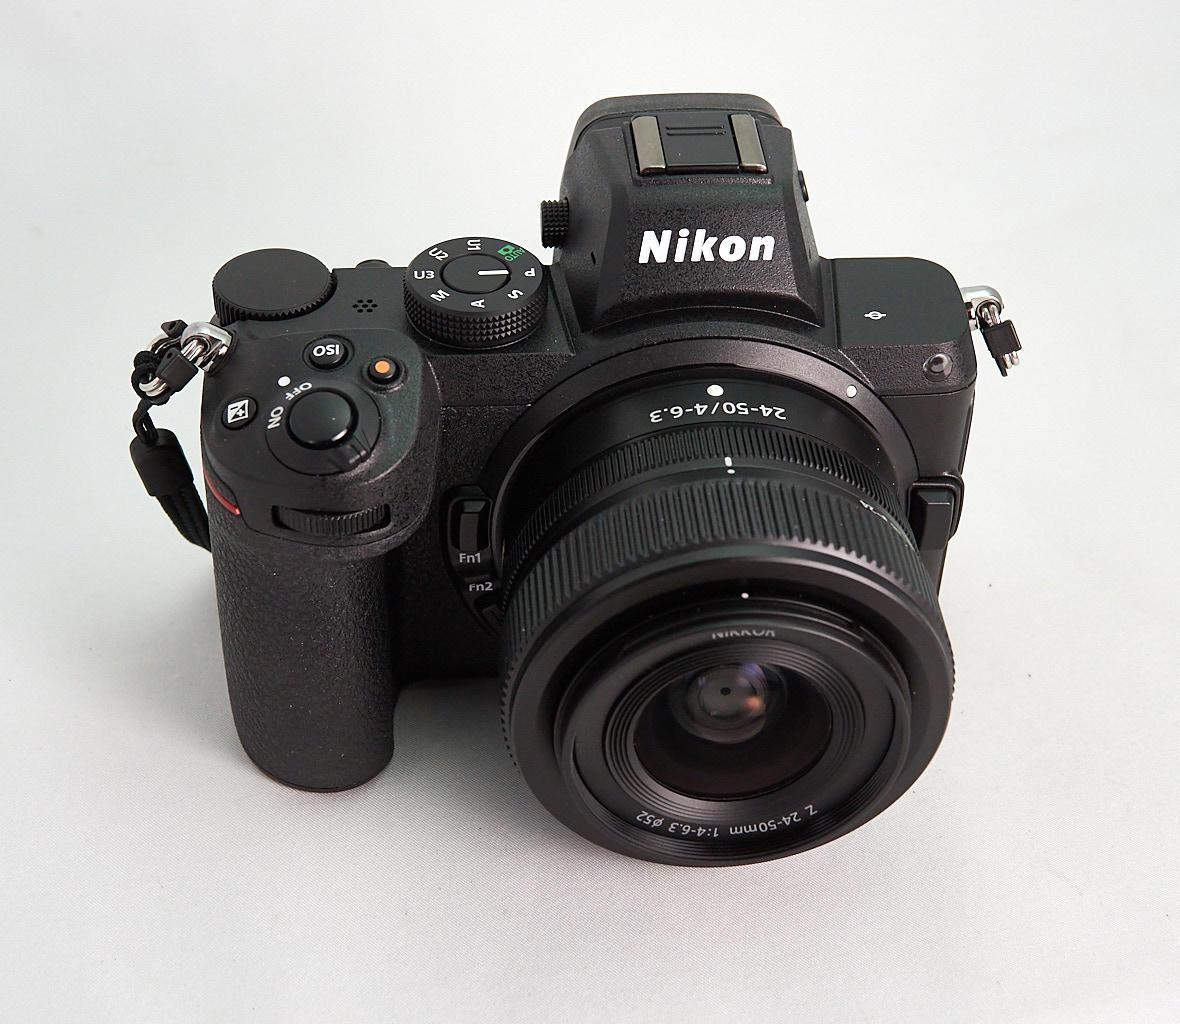 https://thedigitalstory.com/2020/09/15/1024-P9144353-Nikon-Z5.jpg